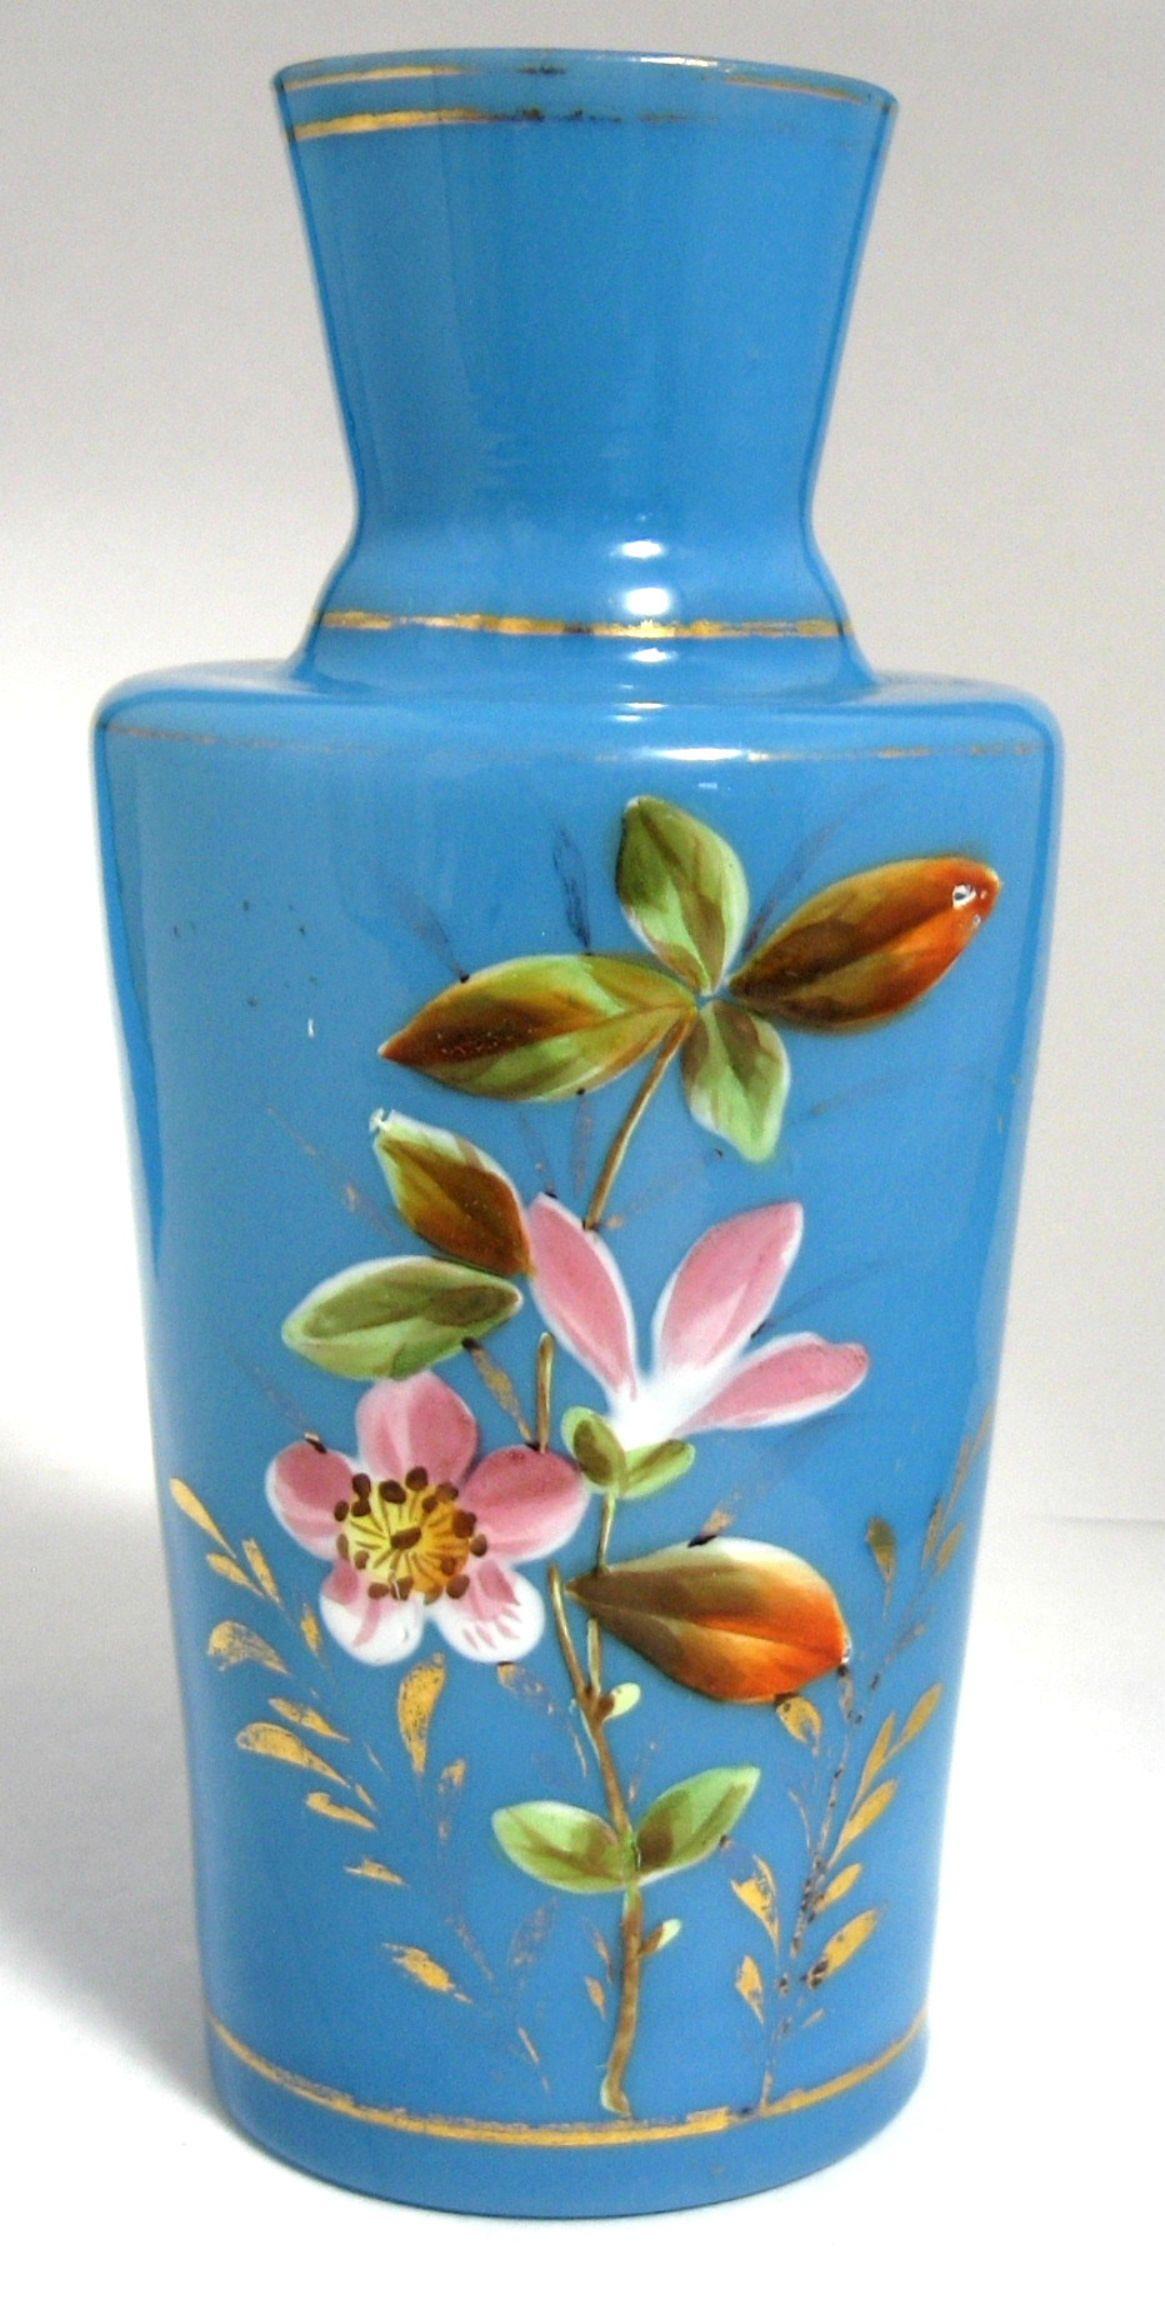 Victorian vase blue bristol glass victorian hand painted english victorian vase blue bristol glass victorian hand painted english 1880 1890s victorian home decor by reviewsmspy